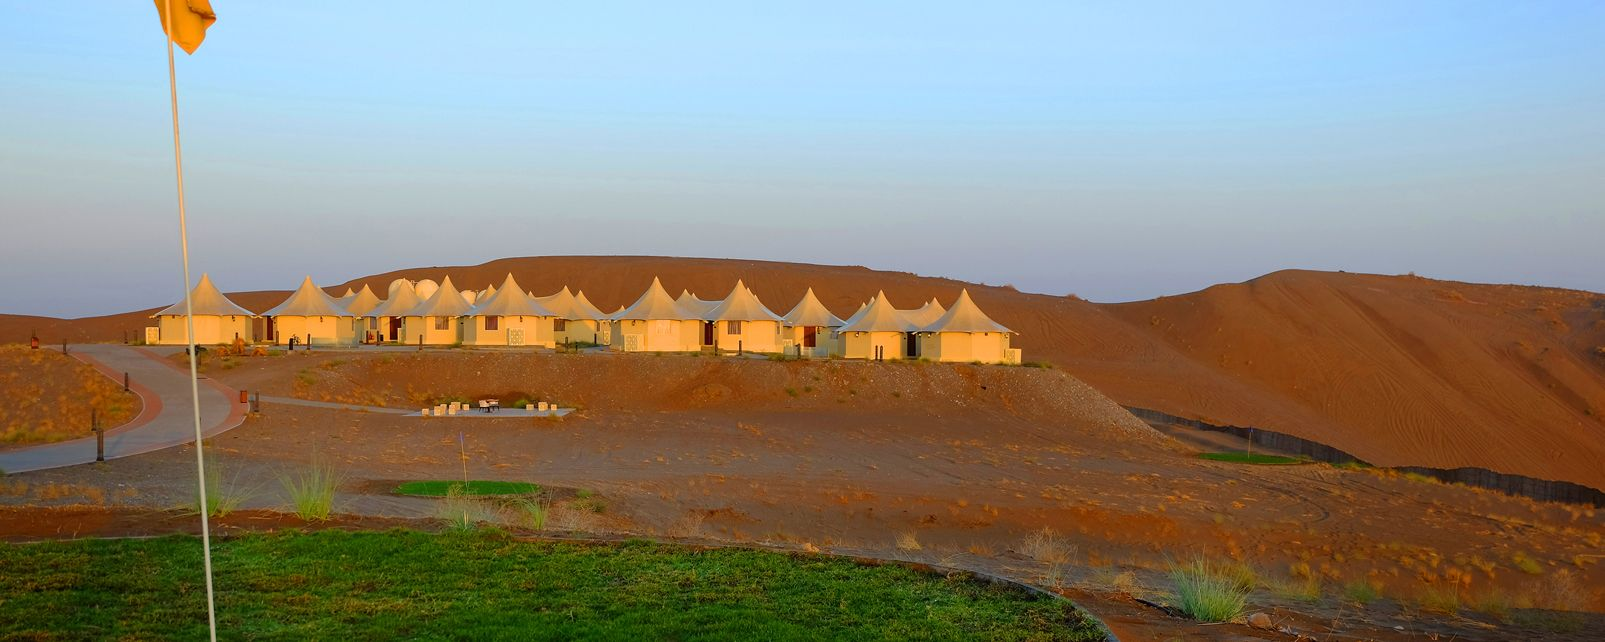 Hôtel Dunes by Al Nahda